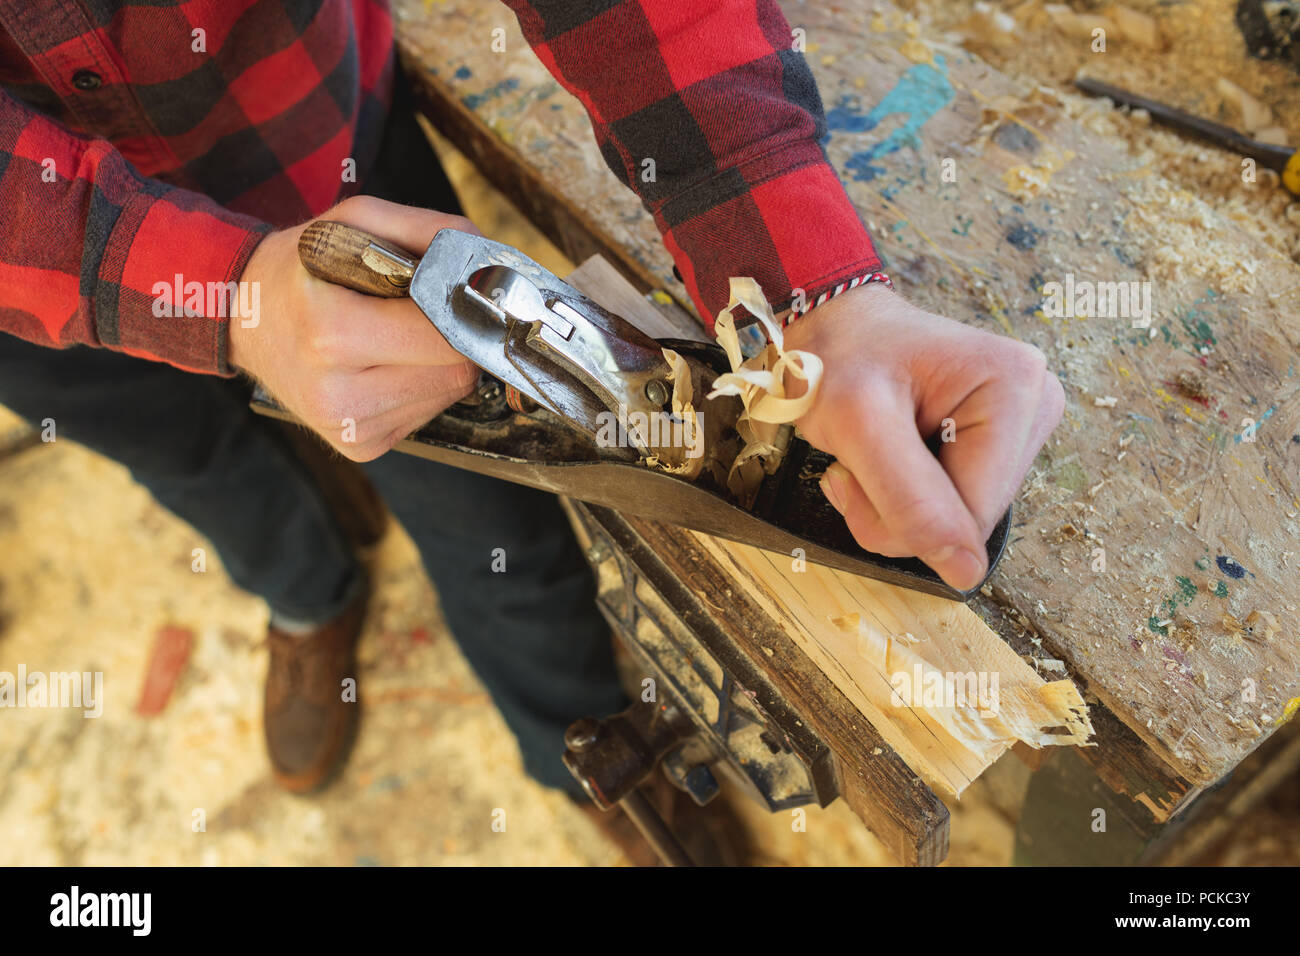 Male carpenter using plane tool in workshop - Stock Image